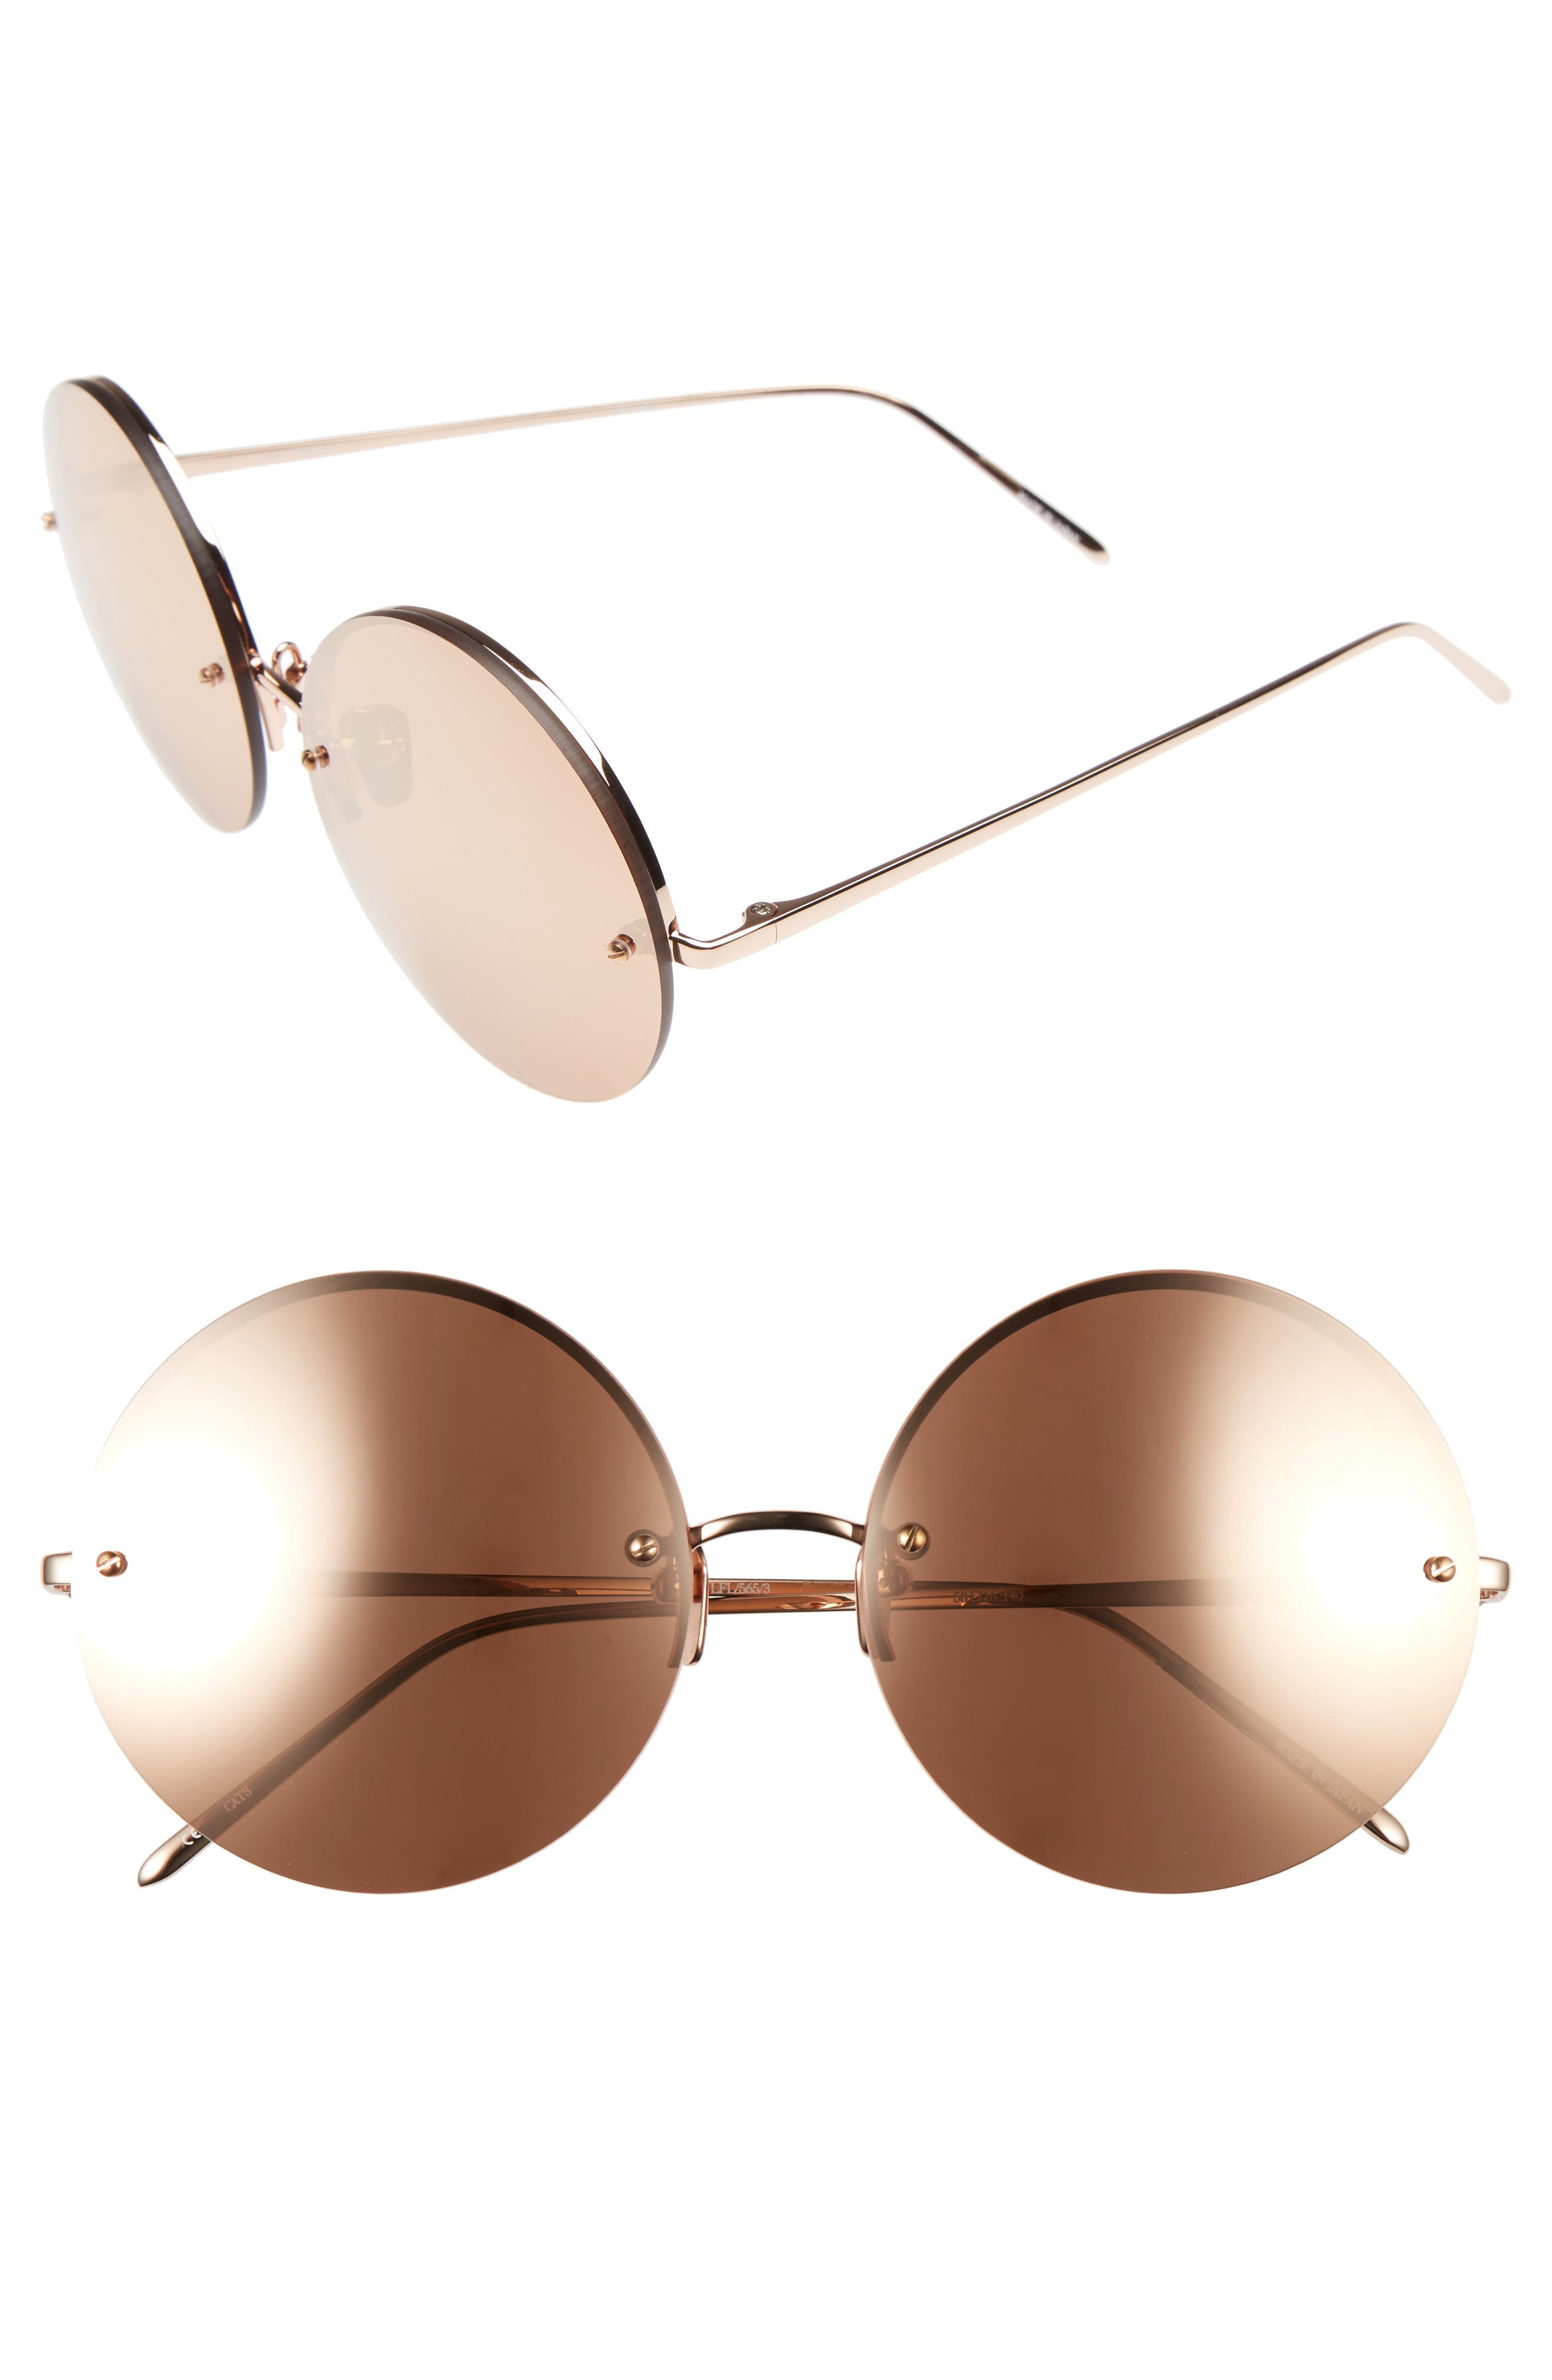 Main Image - Linda Farrow 58mm 22 Karat Gold Trim Rimless Round Sunglasses